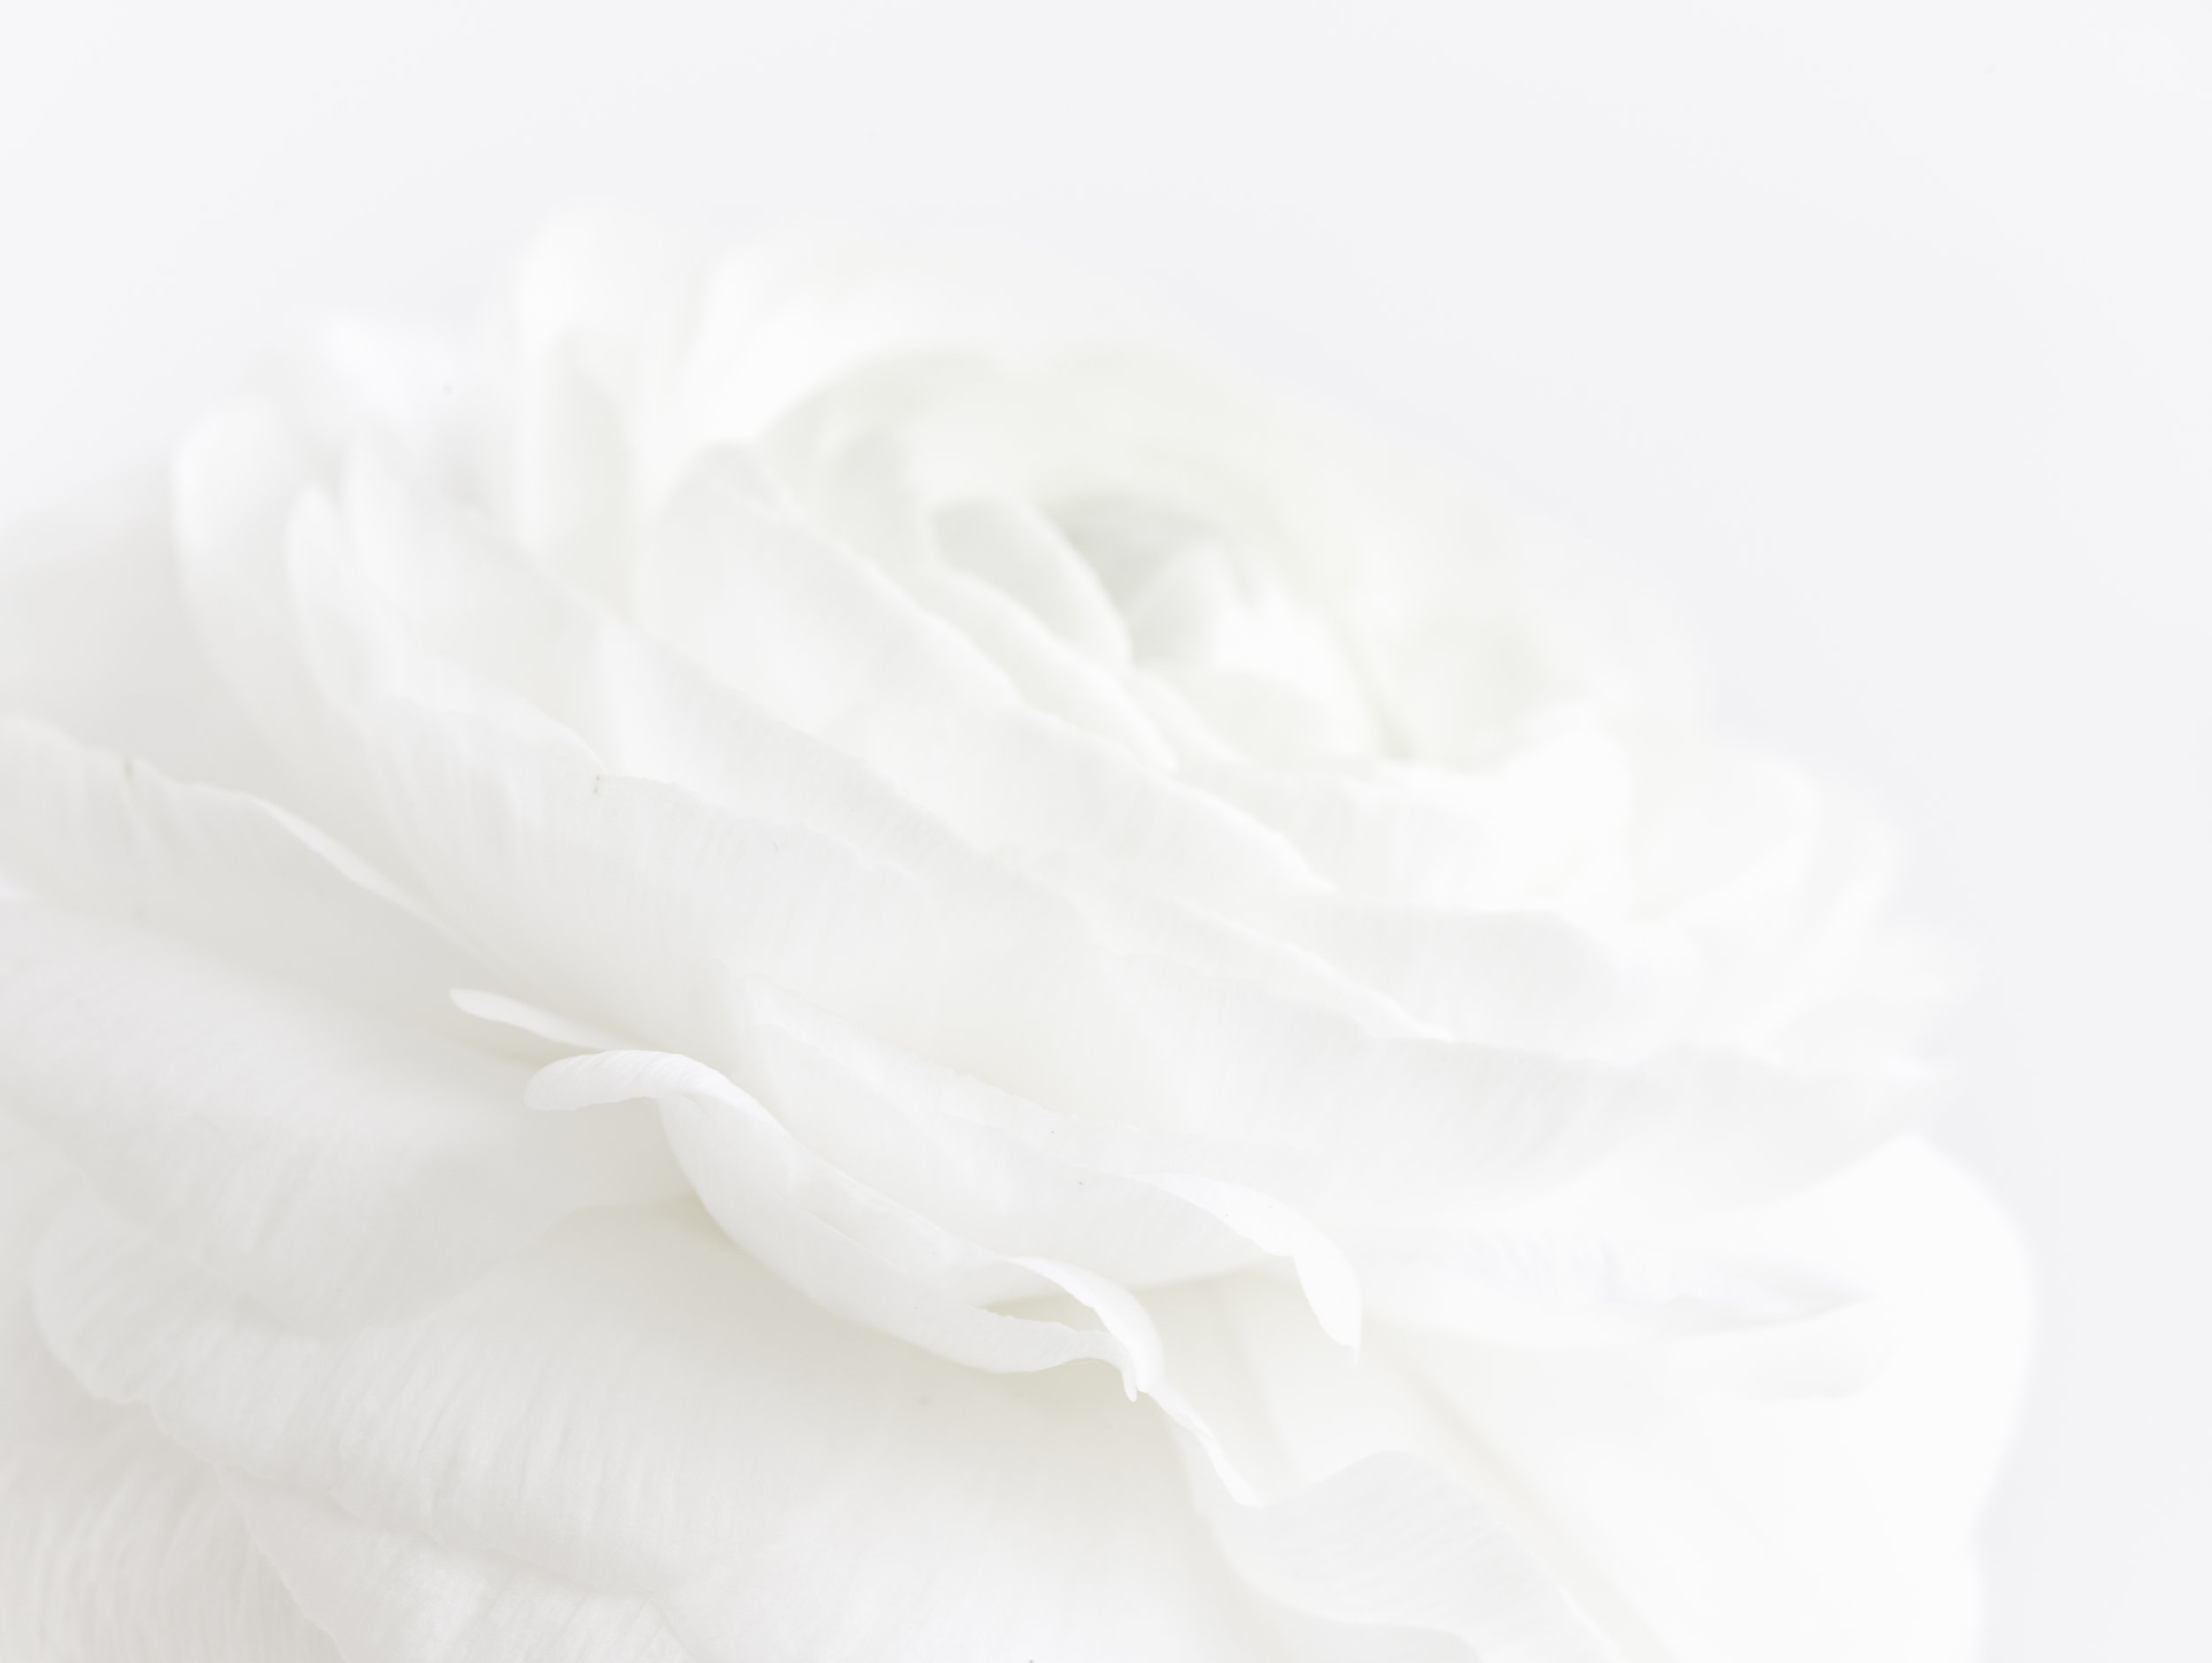 White_Ranunculus_Flowers_-7201.jpg